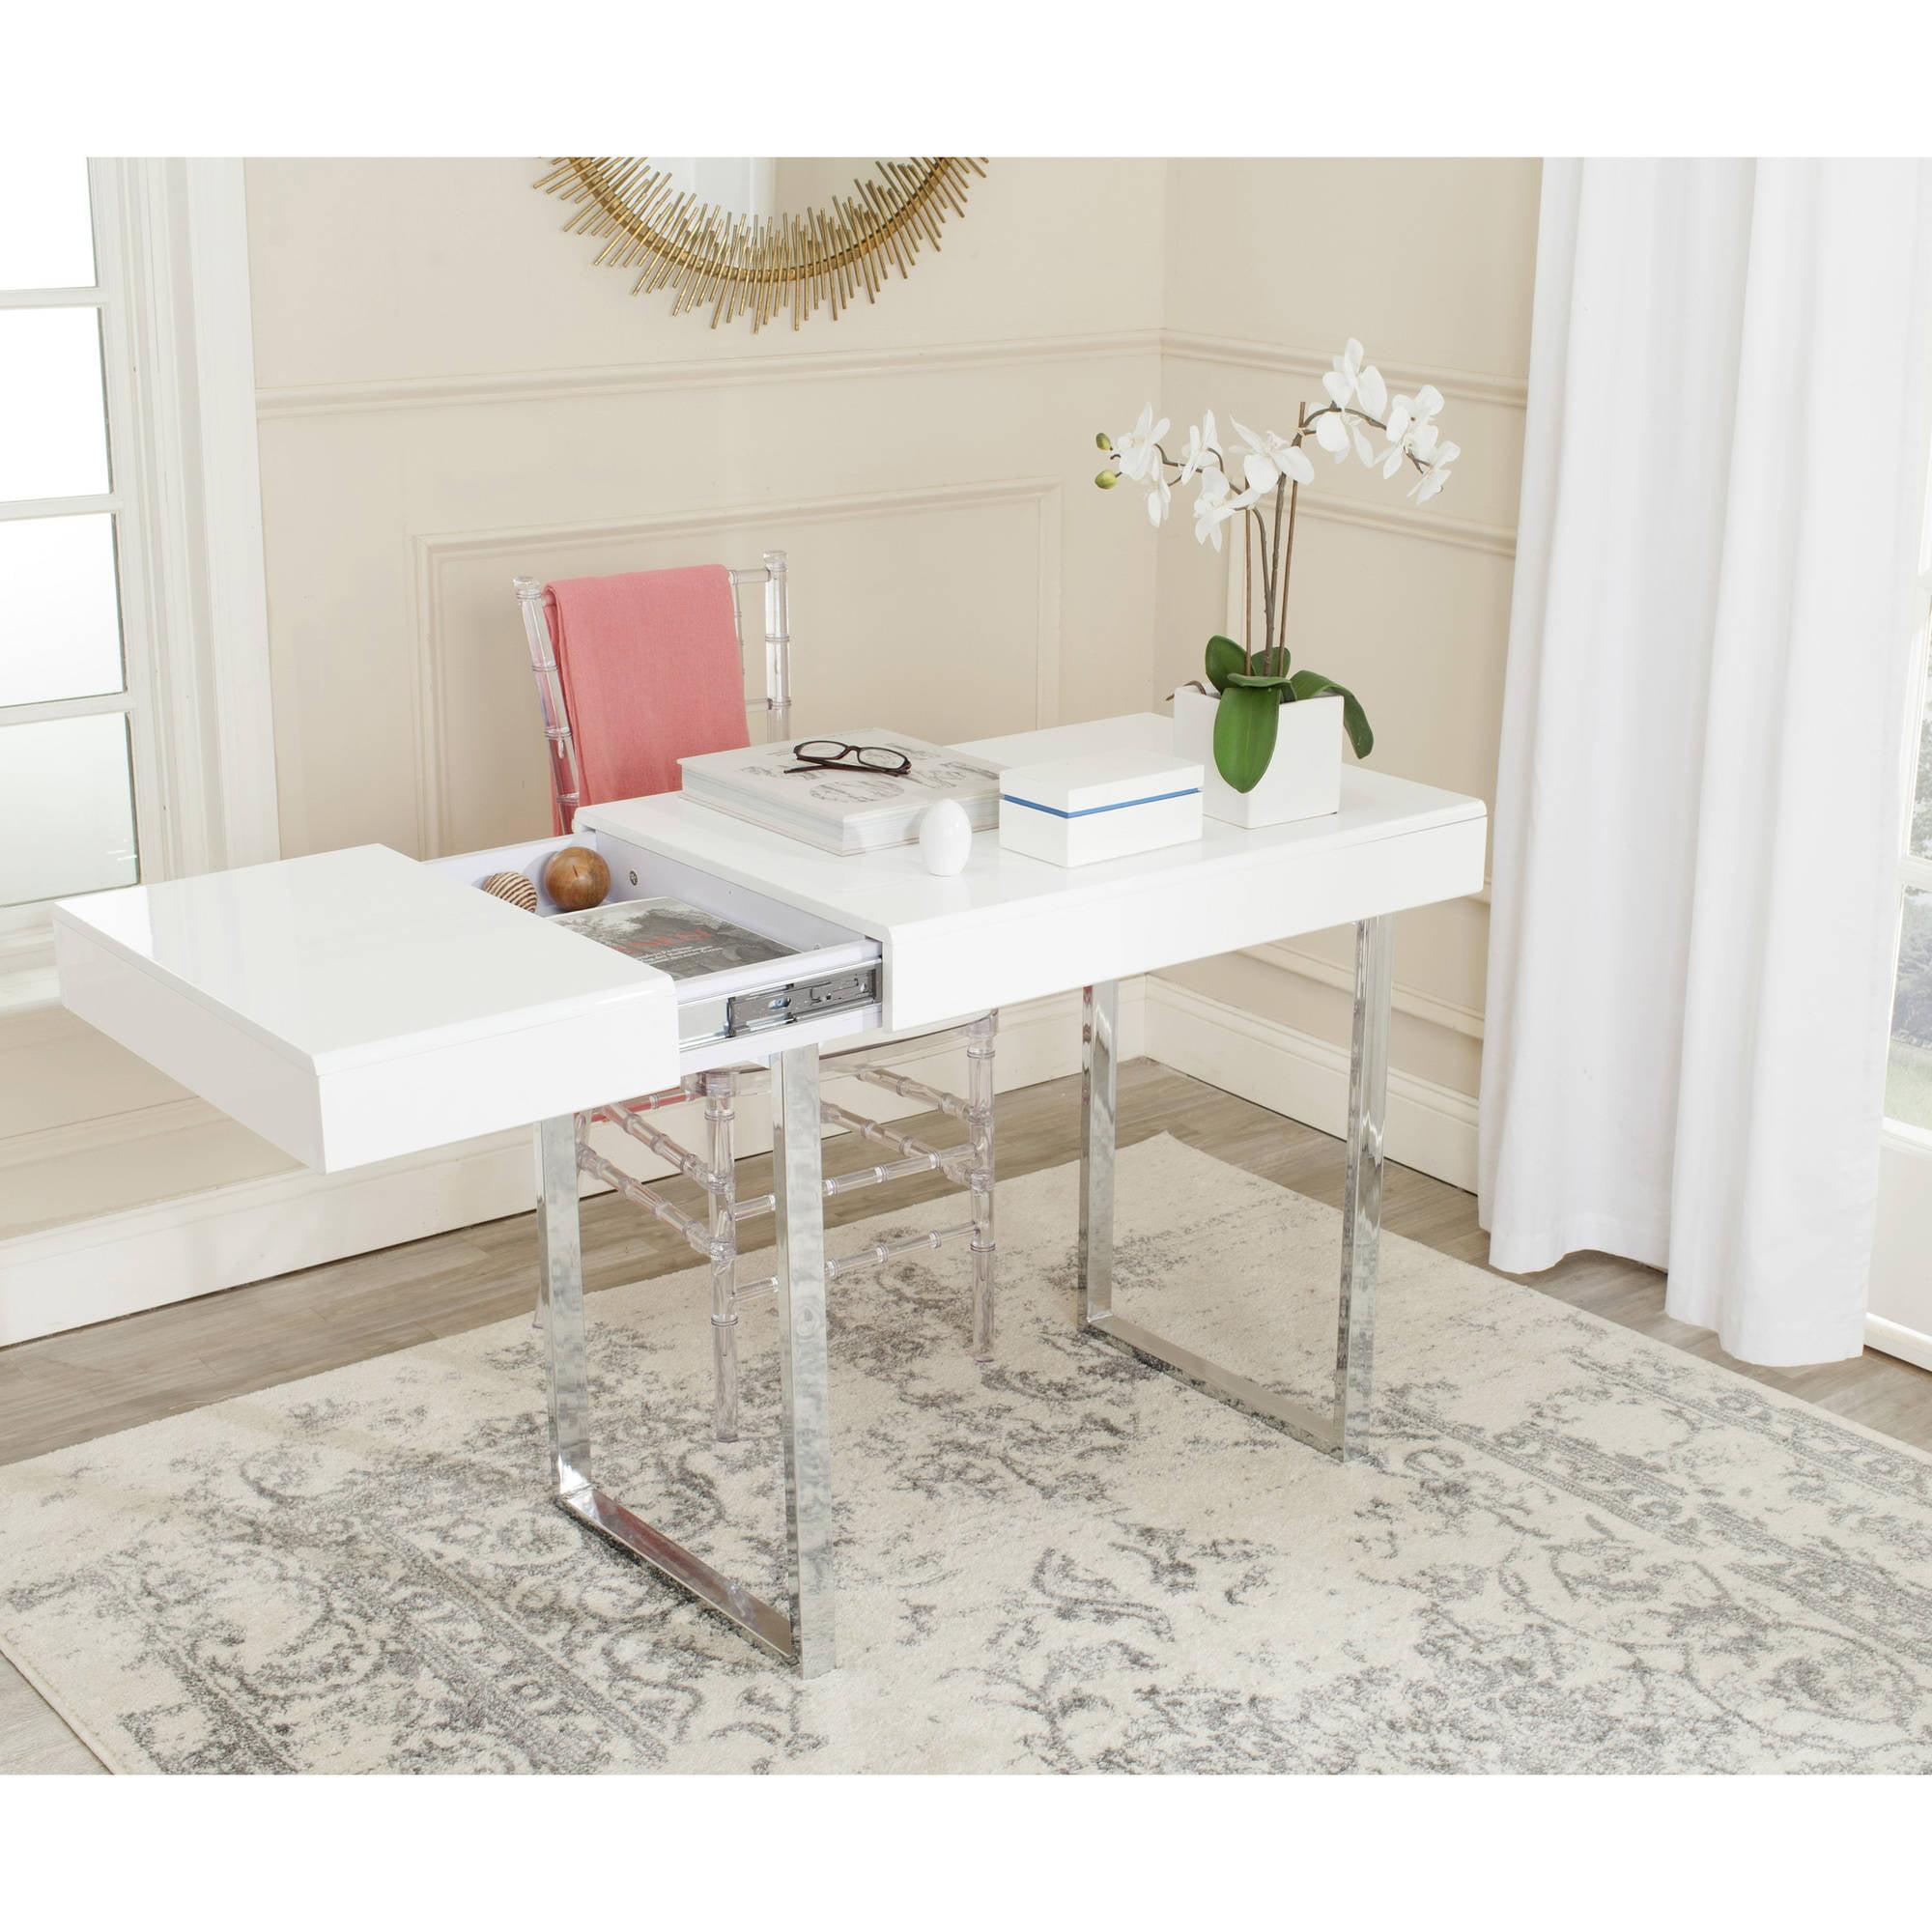 Safavieh Berkley Desk, White and Chrome by Safavieh